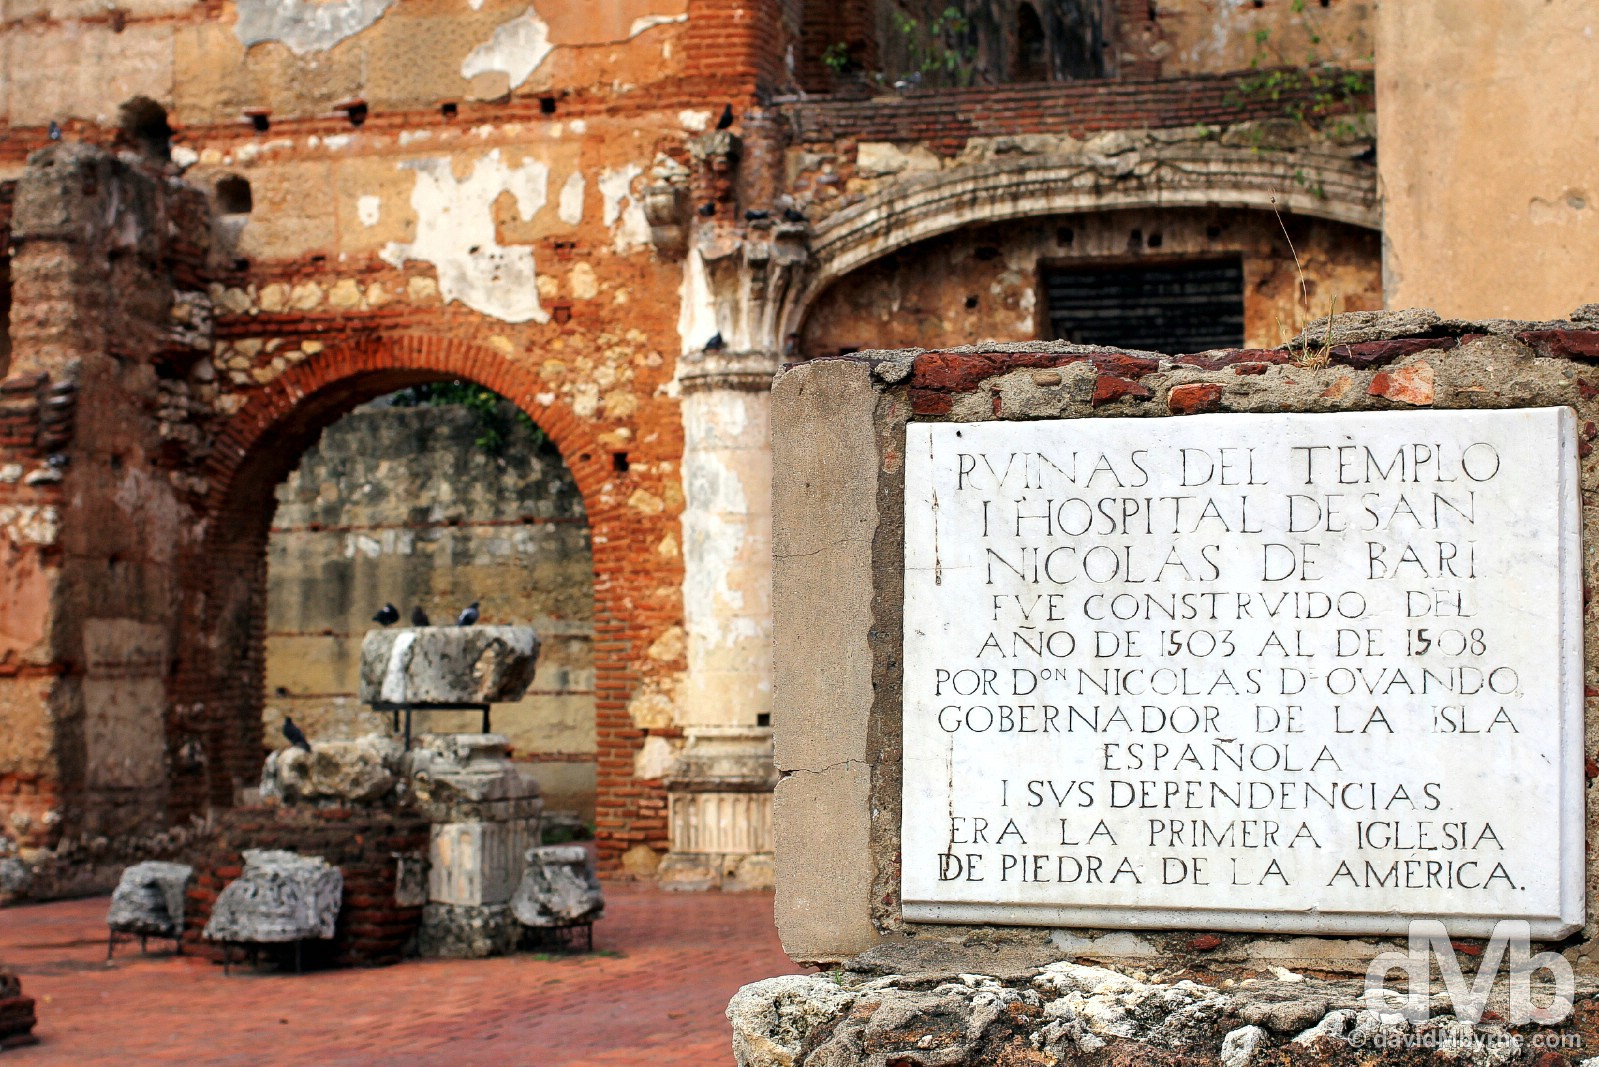 Ruinas del Hospital San Nicolas de Bari, present-day ruins of the New World's first hospital in Zona Colonial, Santo Domingo, Dominican Republic. May 26, 2015.